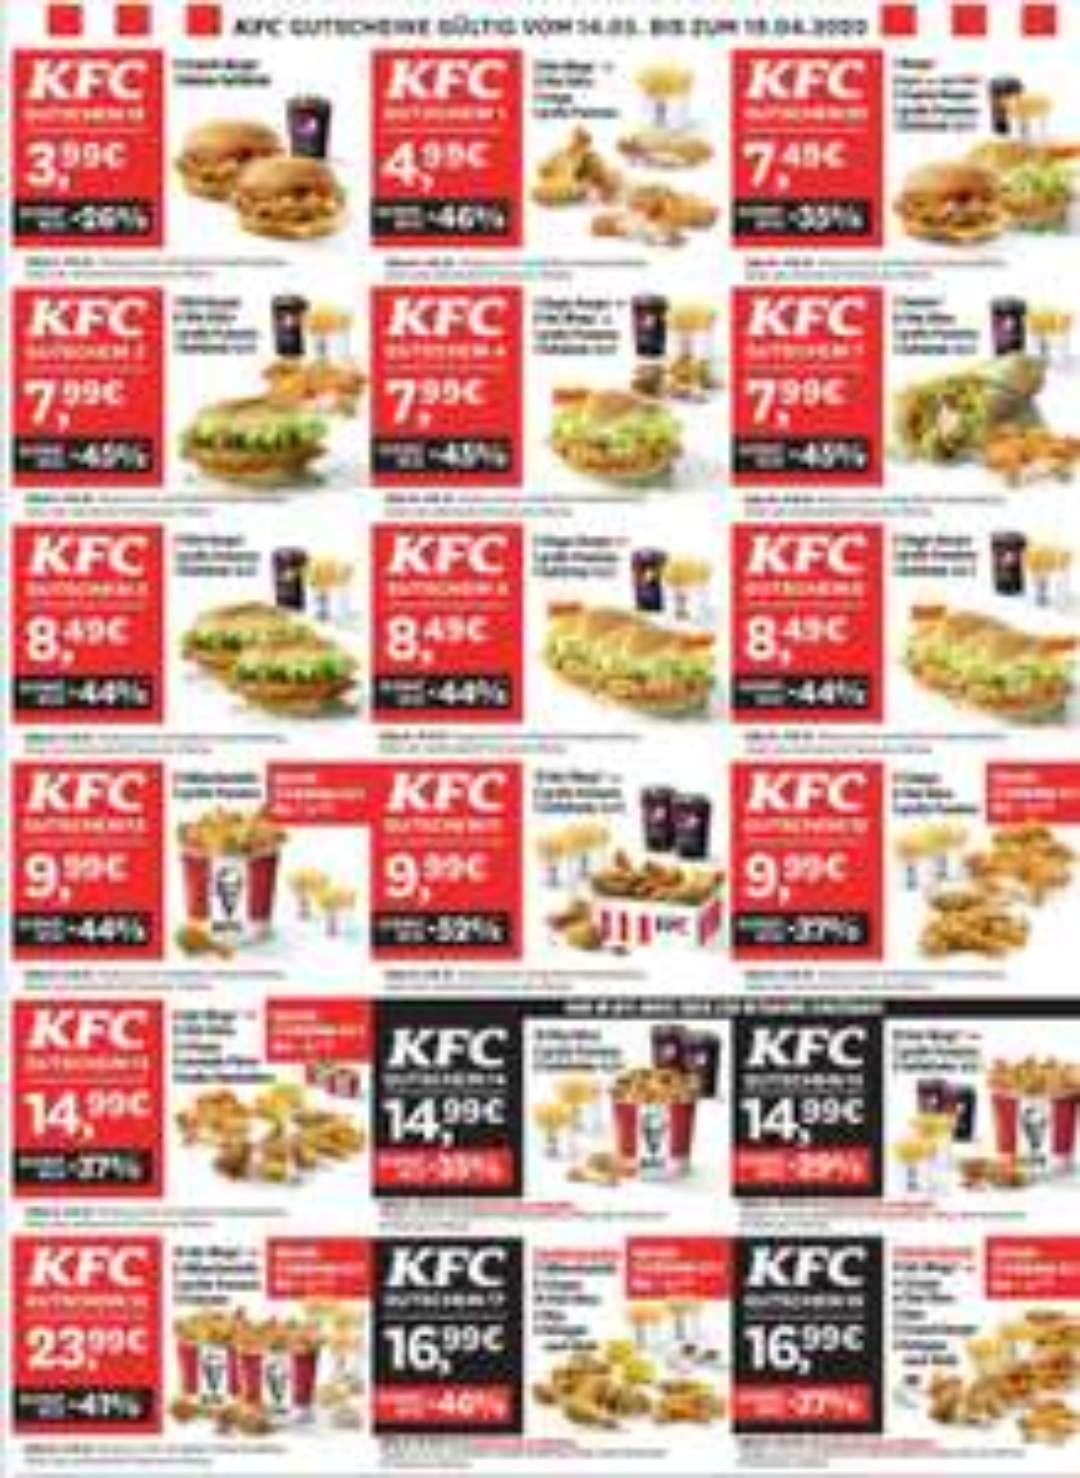 kfc in deutschland karte KFC Angebote & Deals ⇒ Oktober 2020   mydealz.de